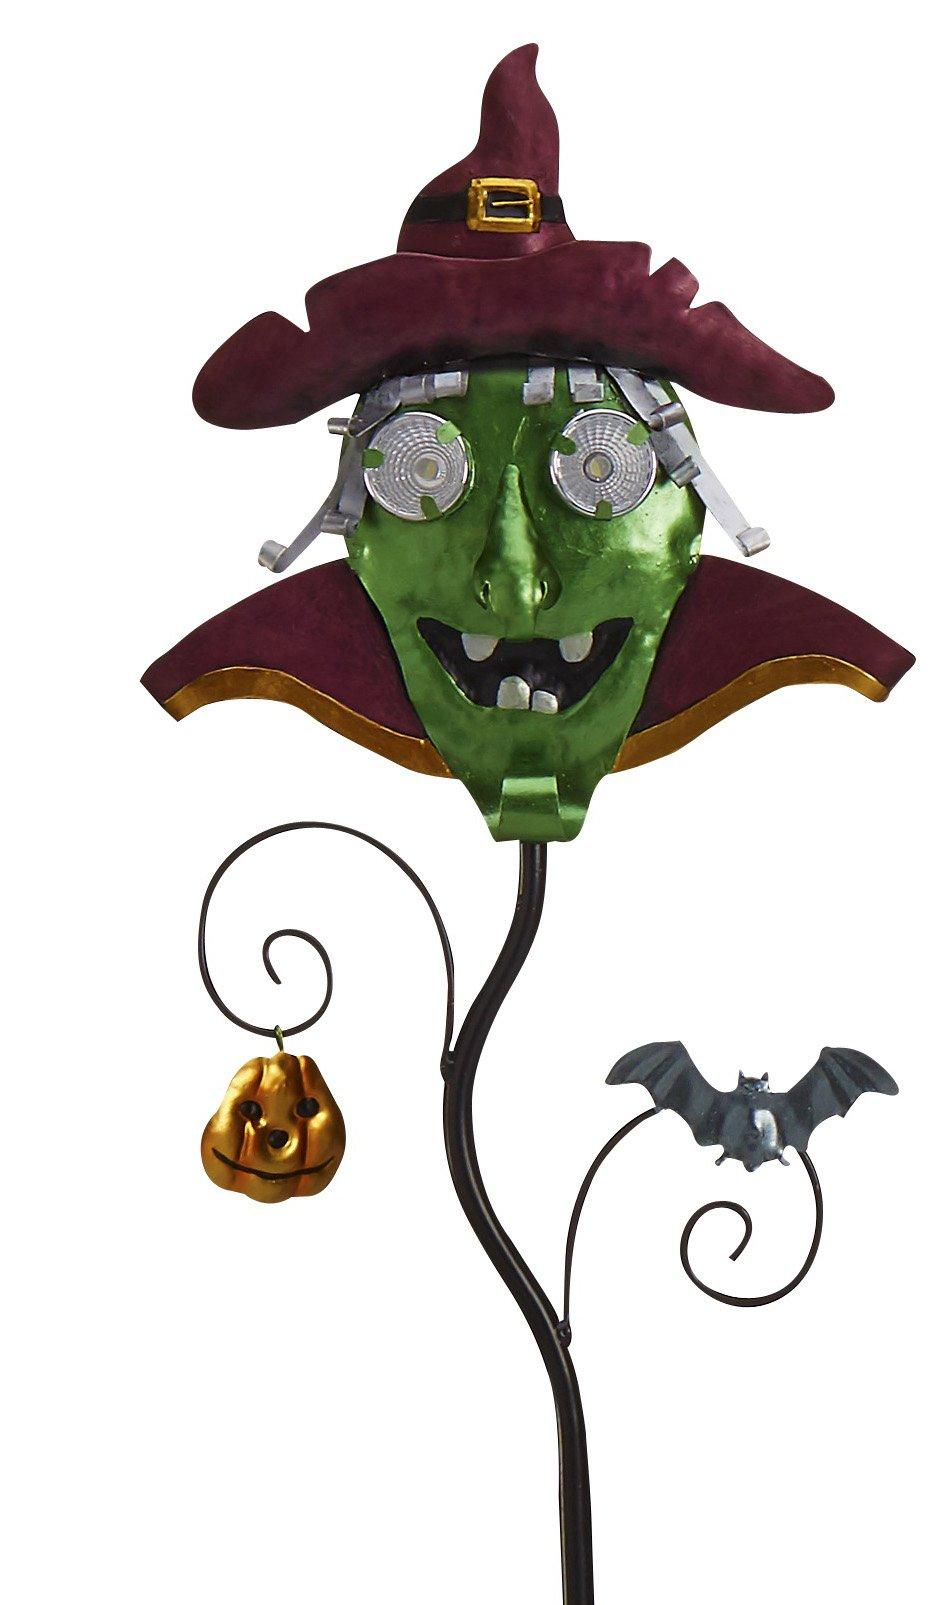 Goblin Guiders - Solar Powered Halloween Decorative Lights - Green Goblin